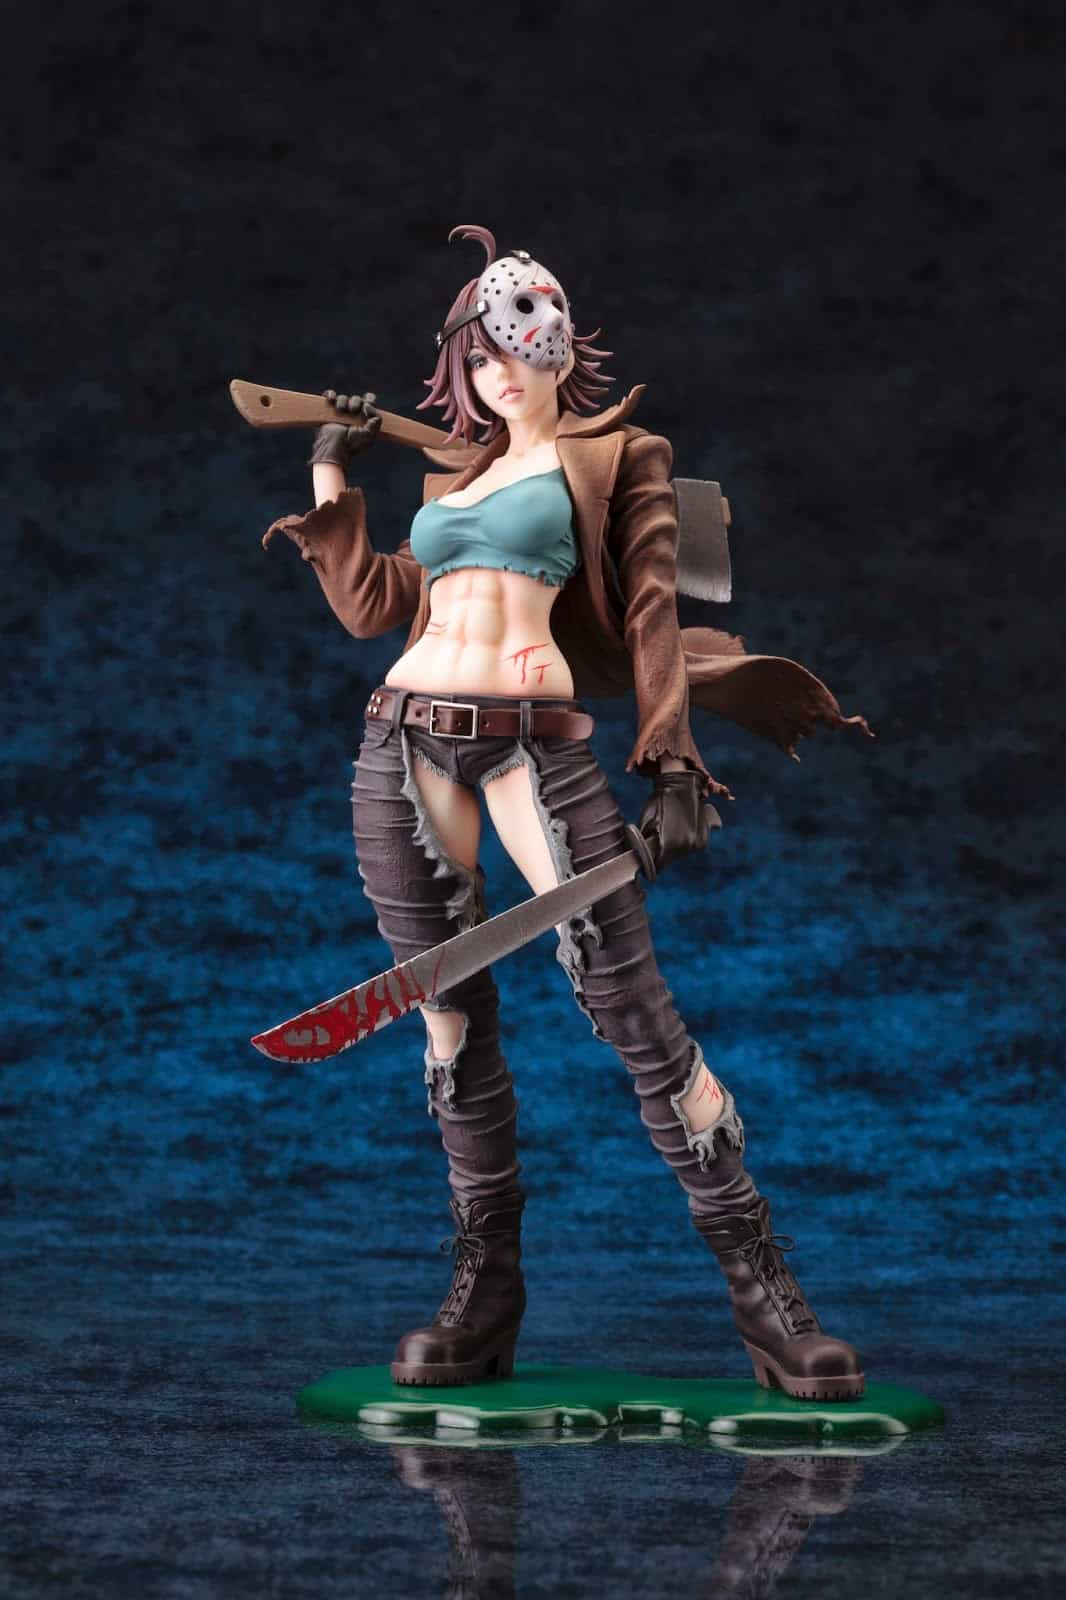 Kotobukiya Freddy vs. Jason Jason Voorhees Bishoujo Statue Sexy Gender Bender Character